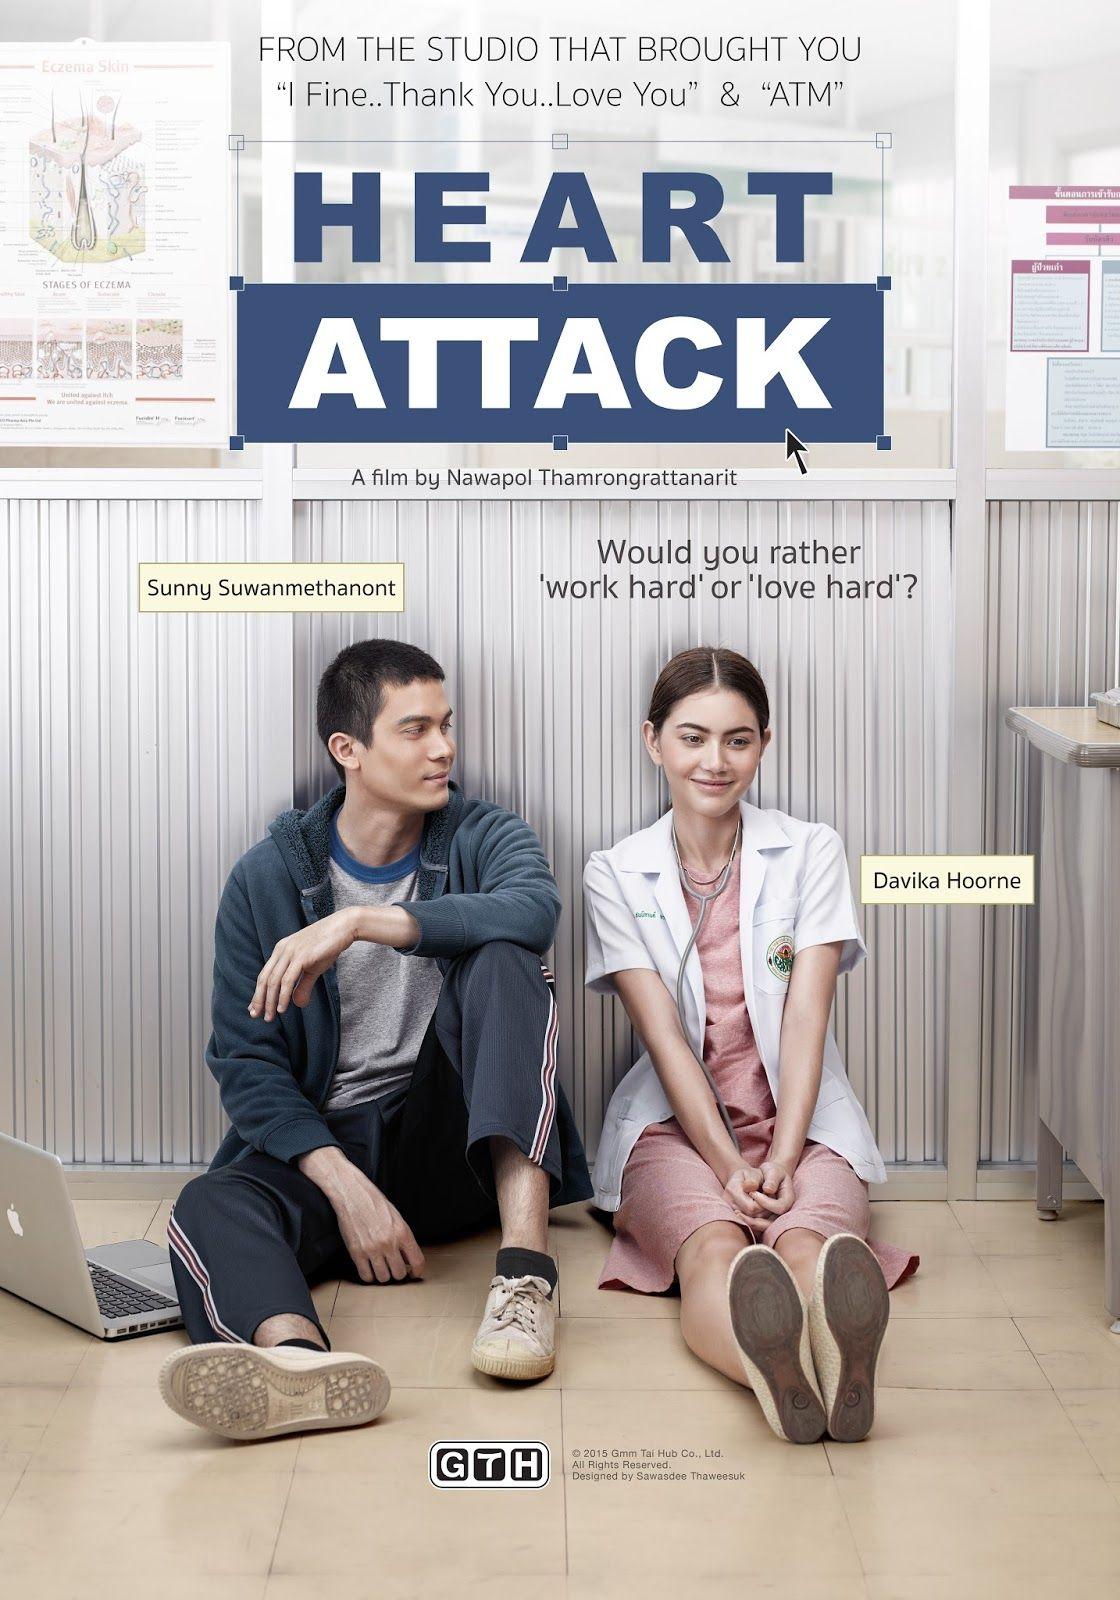 lance heart attack subtitle dramaku net thai lance heart attack subtitle dramaku net